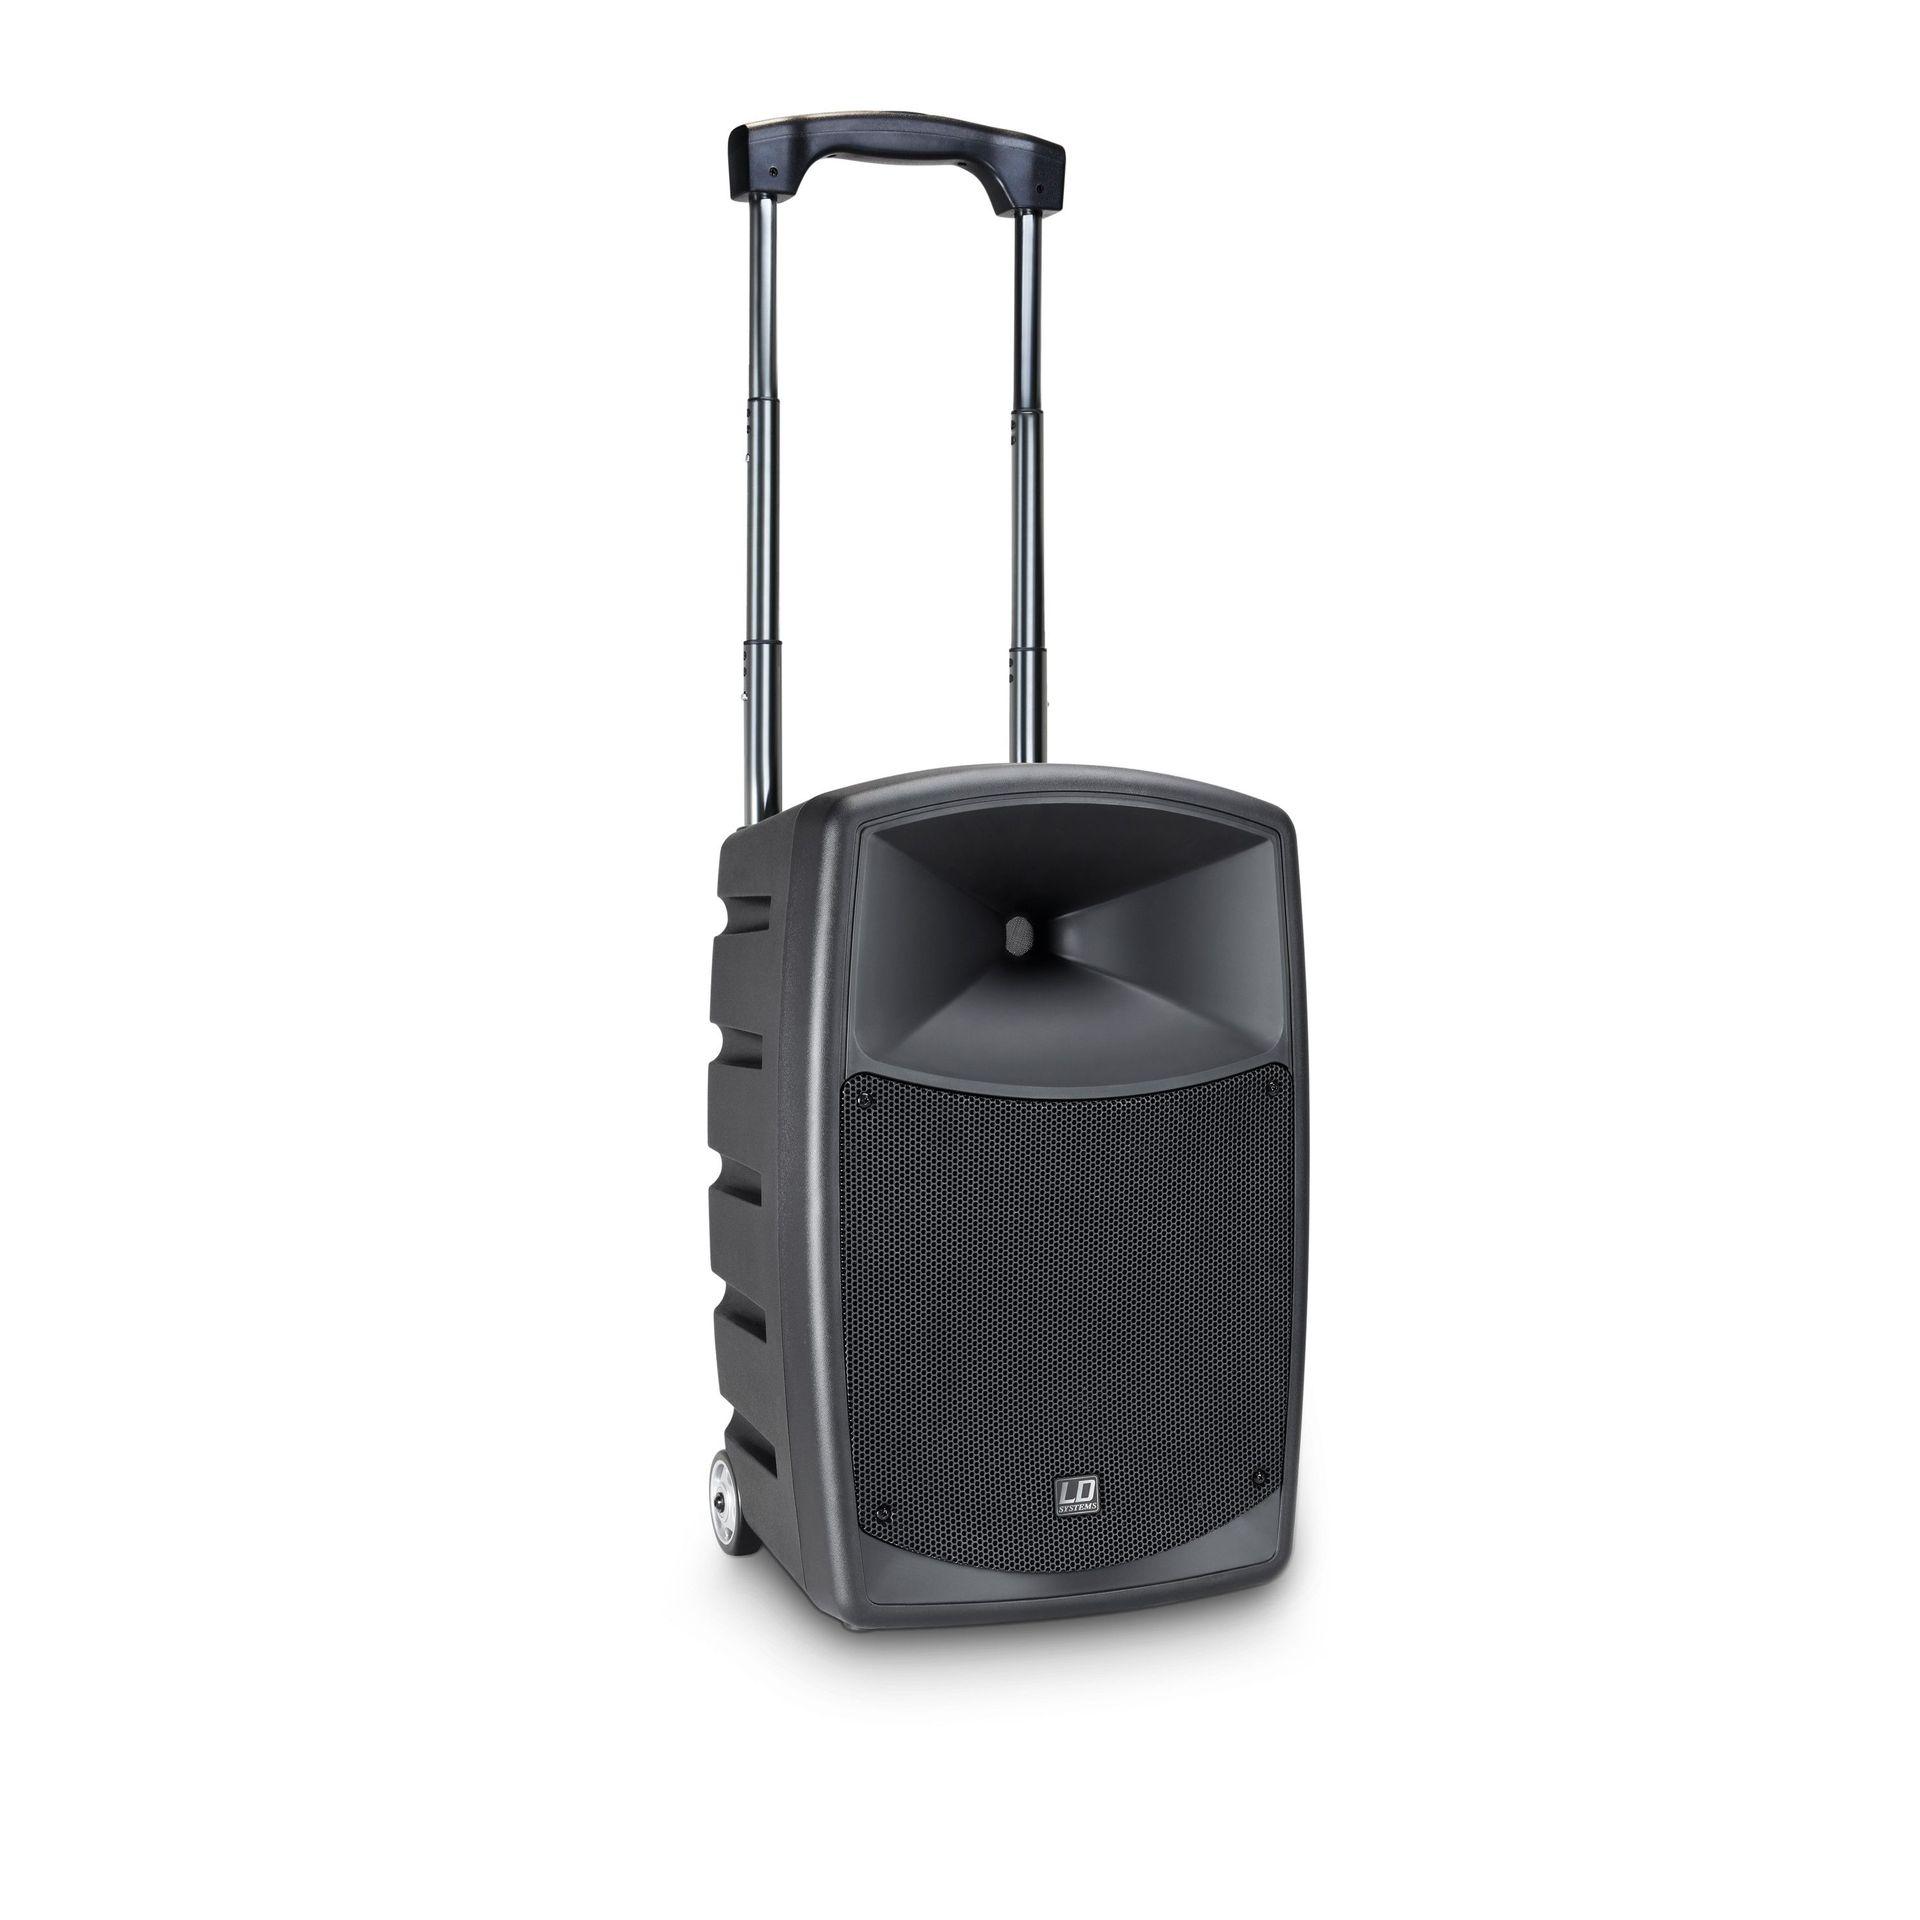 LD Systems Roadbuddy 10 Basic Akkubetriebene Bluetooth-Lautsprecherbox mit Mixer